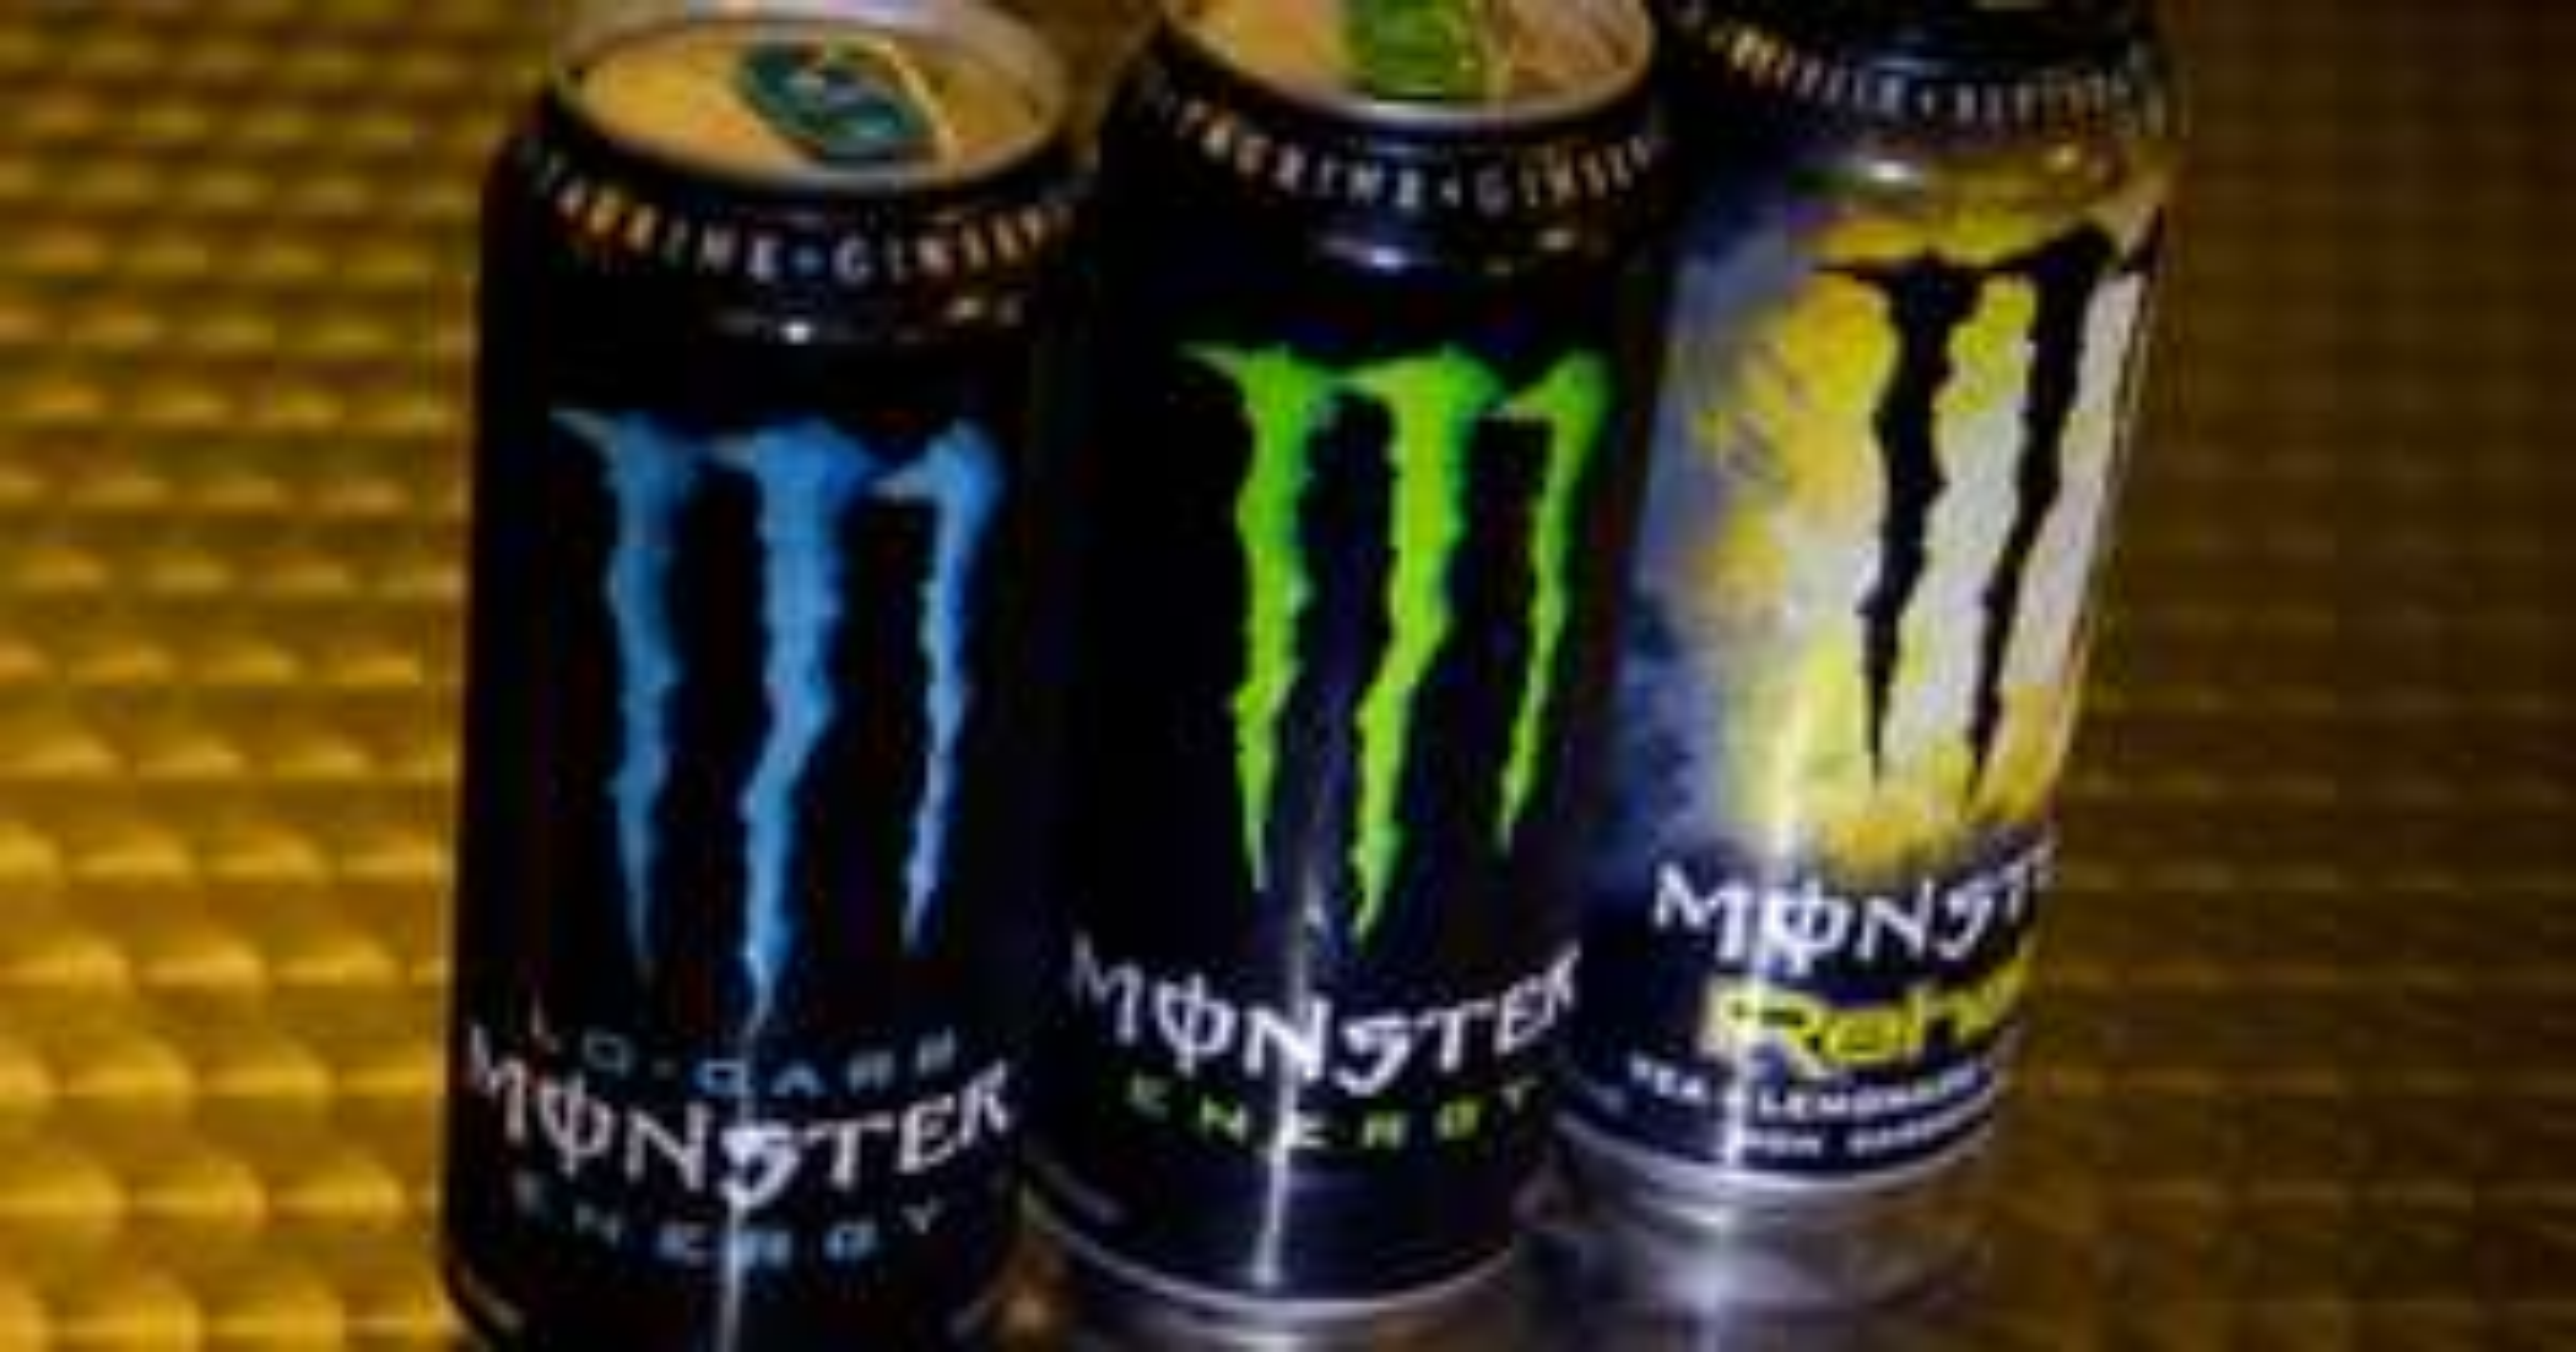 Penny ab Freitag (09.03.): Monster Energy Drink 0,5l für 0,85 €